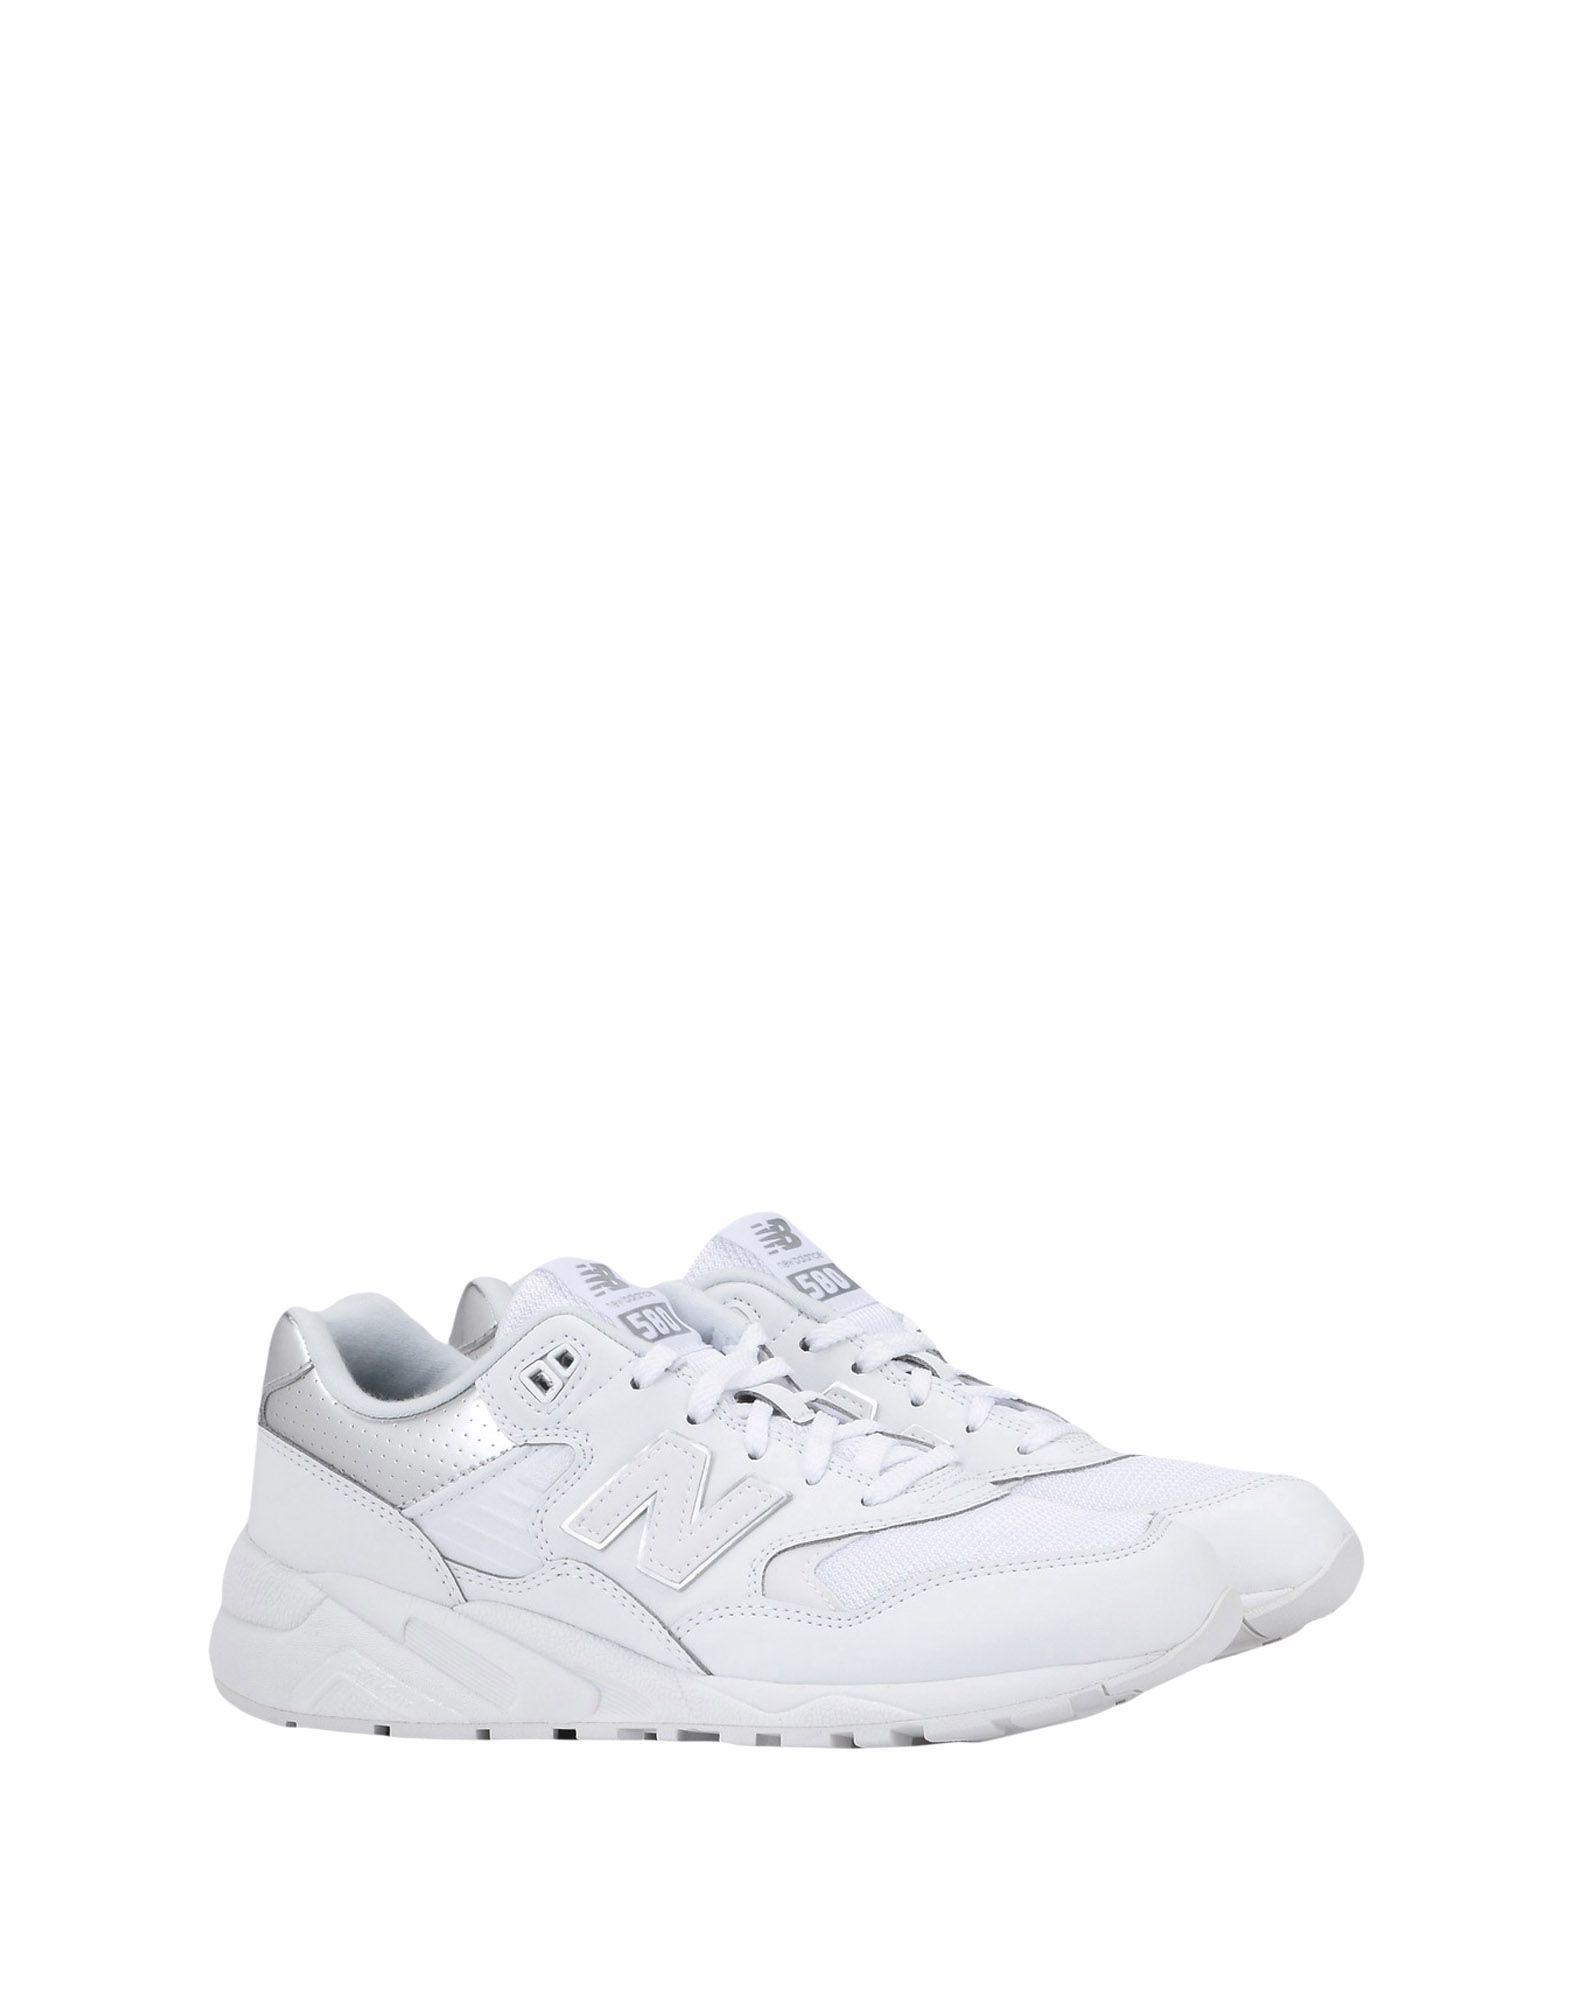 New Balance 580 White Silver Pack  11264571RL Gute Gute 11264571RL Qualität beliebte Schuhe 2c9b79